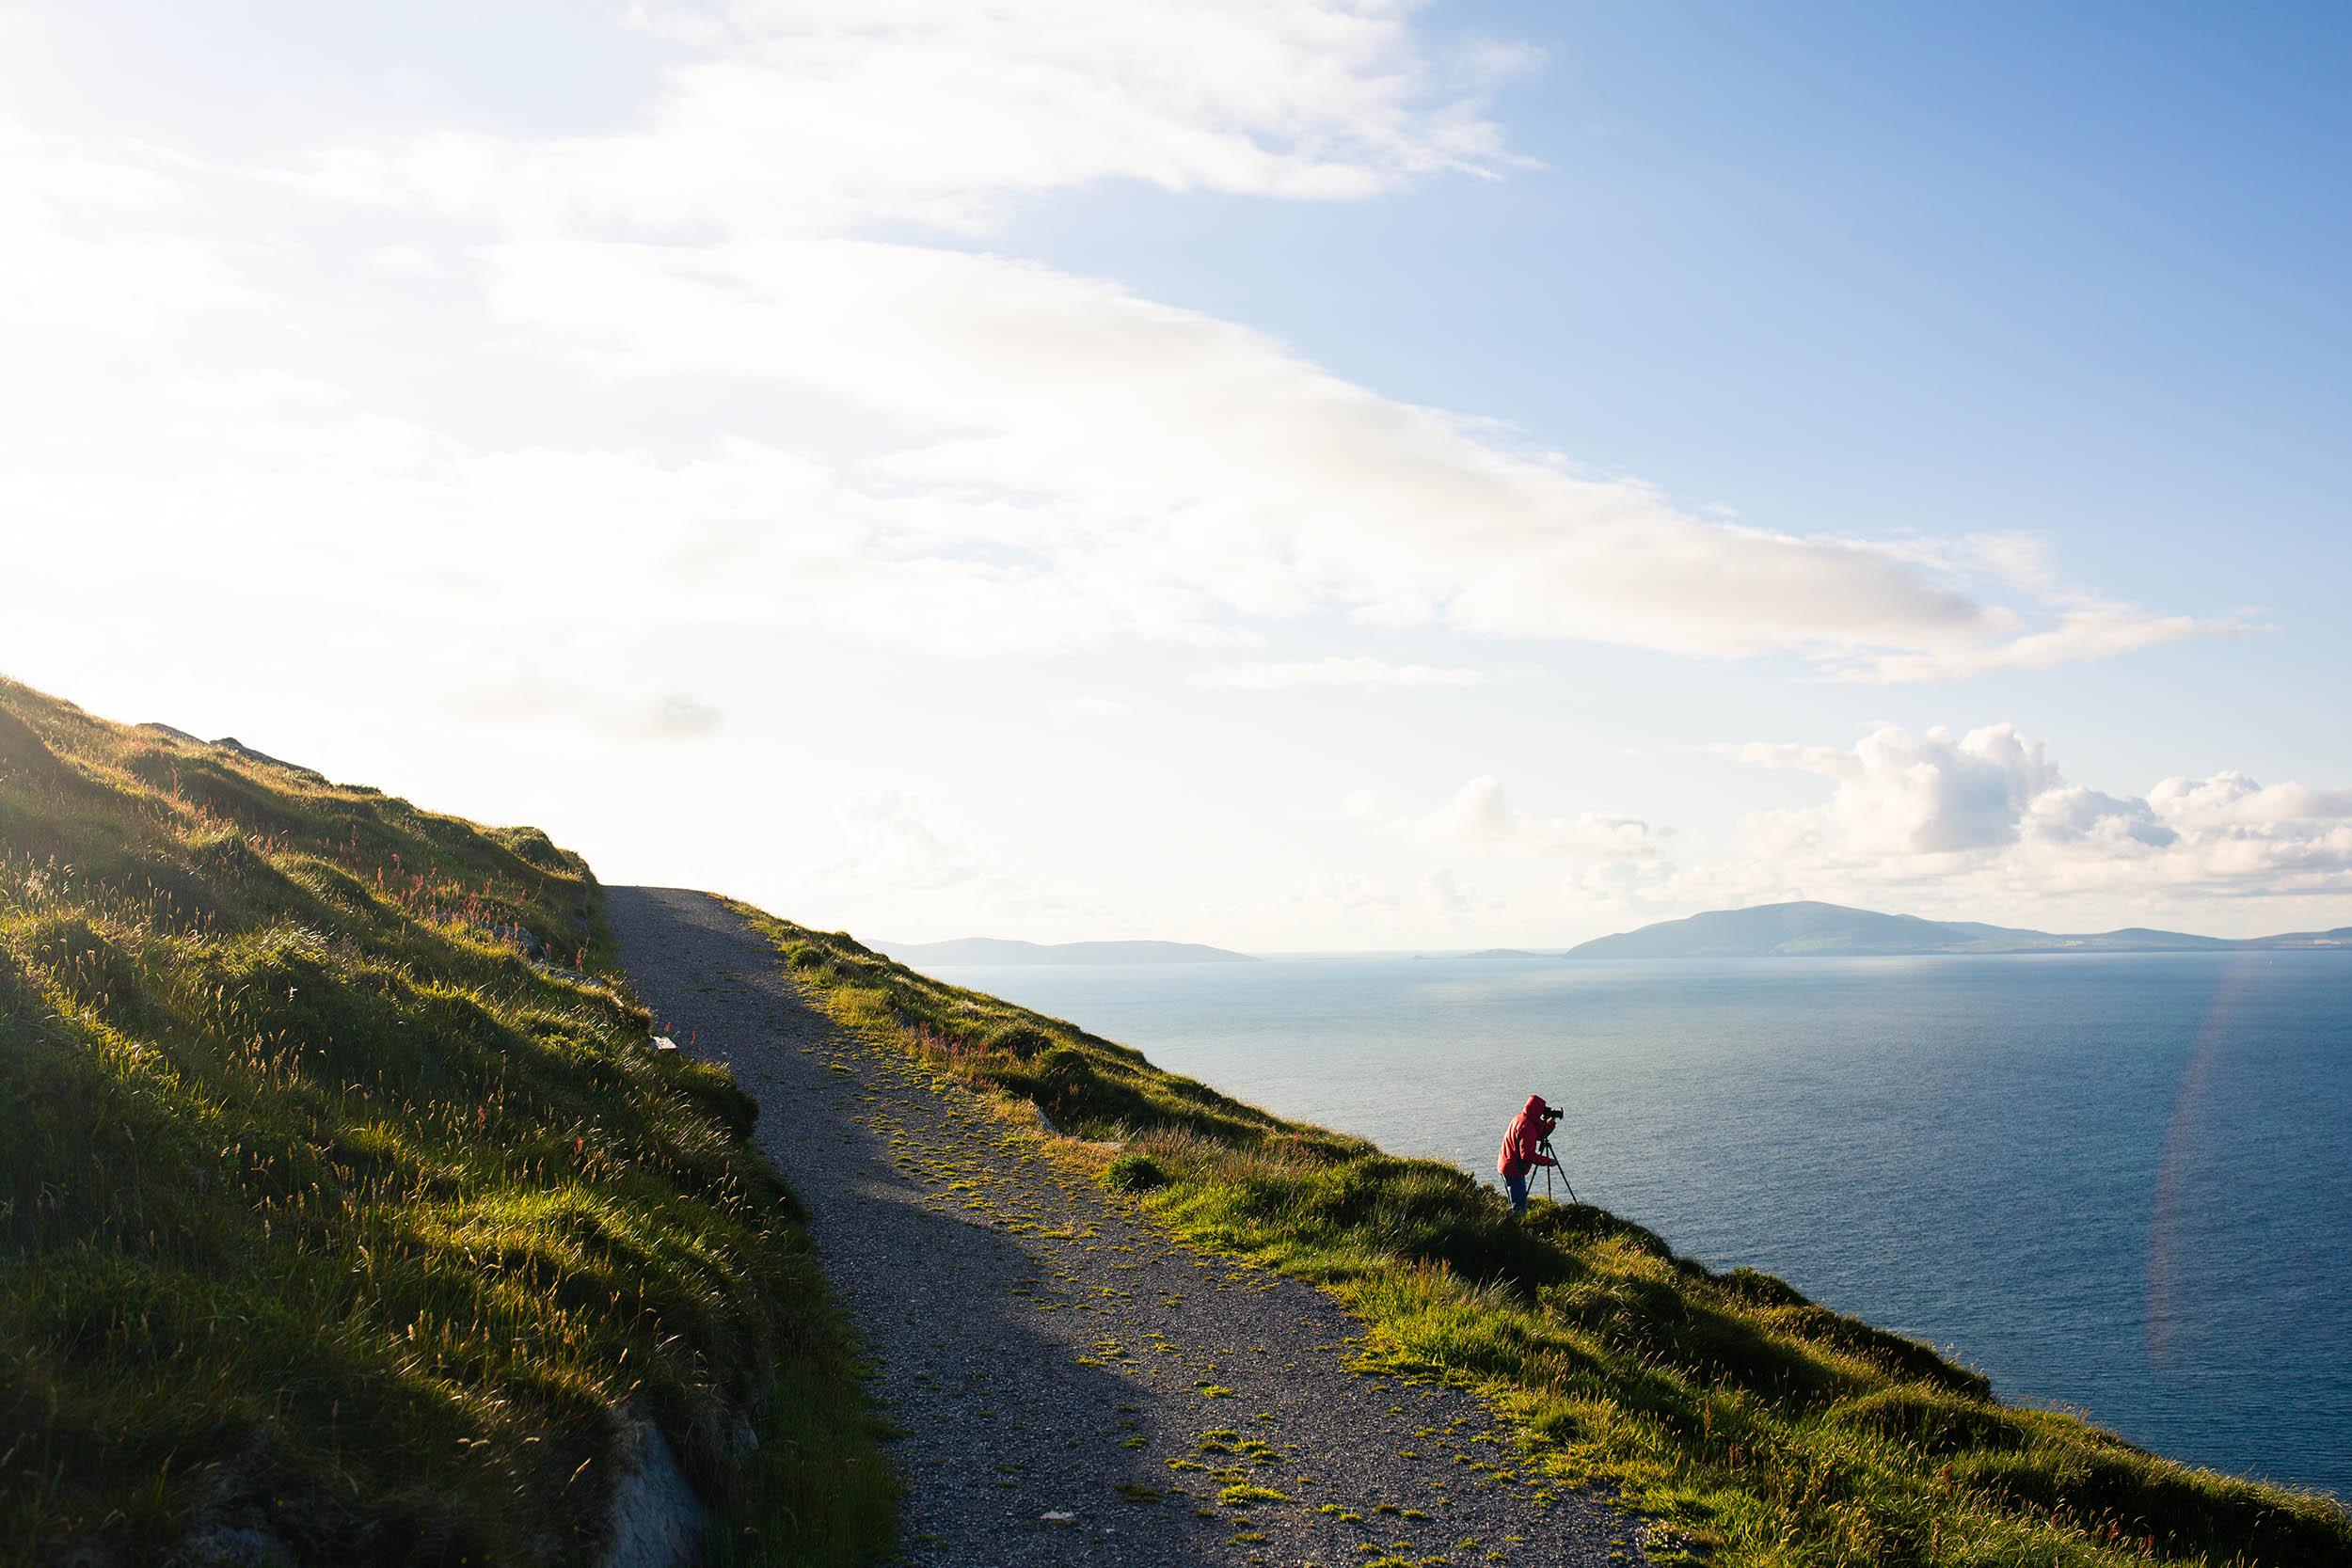 IRELAND_KERRY_VALENTIAISLAND_0029